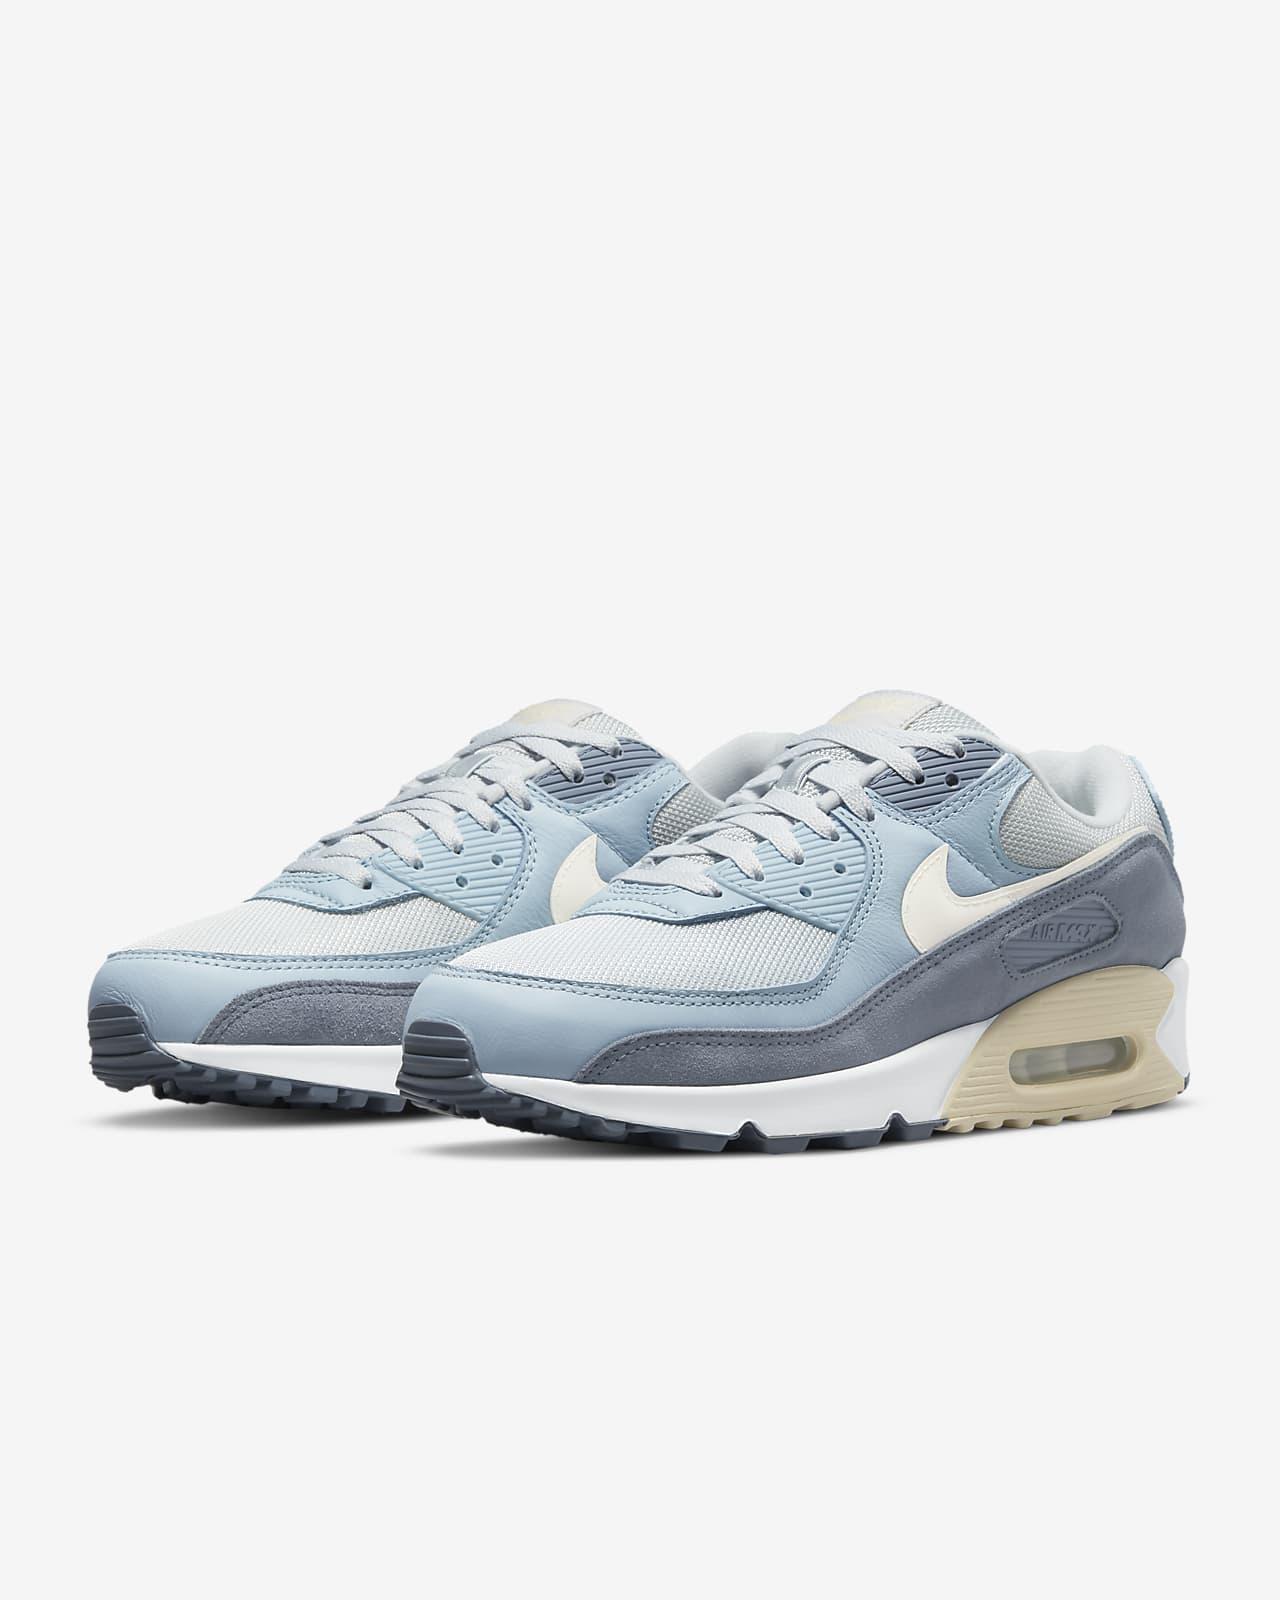 Nike Air Max 90 Premium Men's Shoes. Nike AE